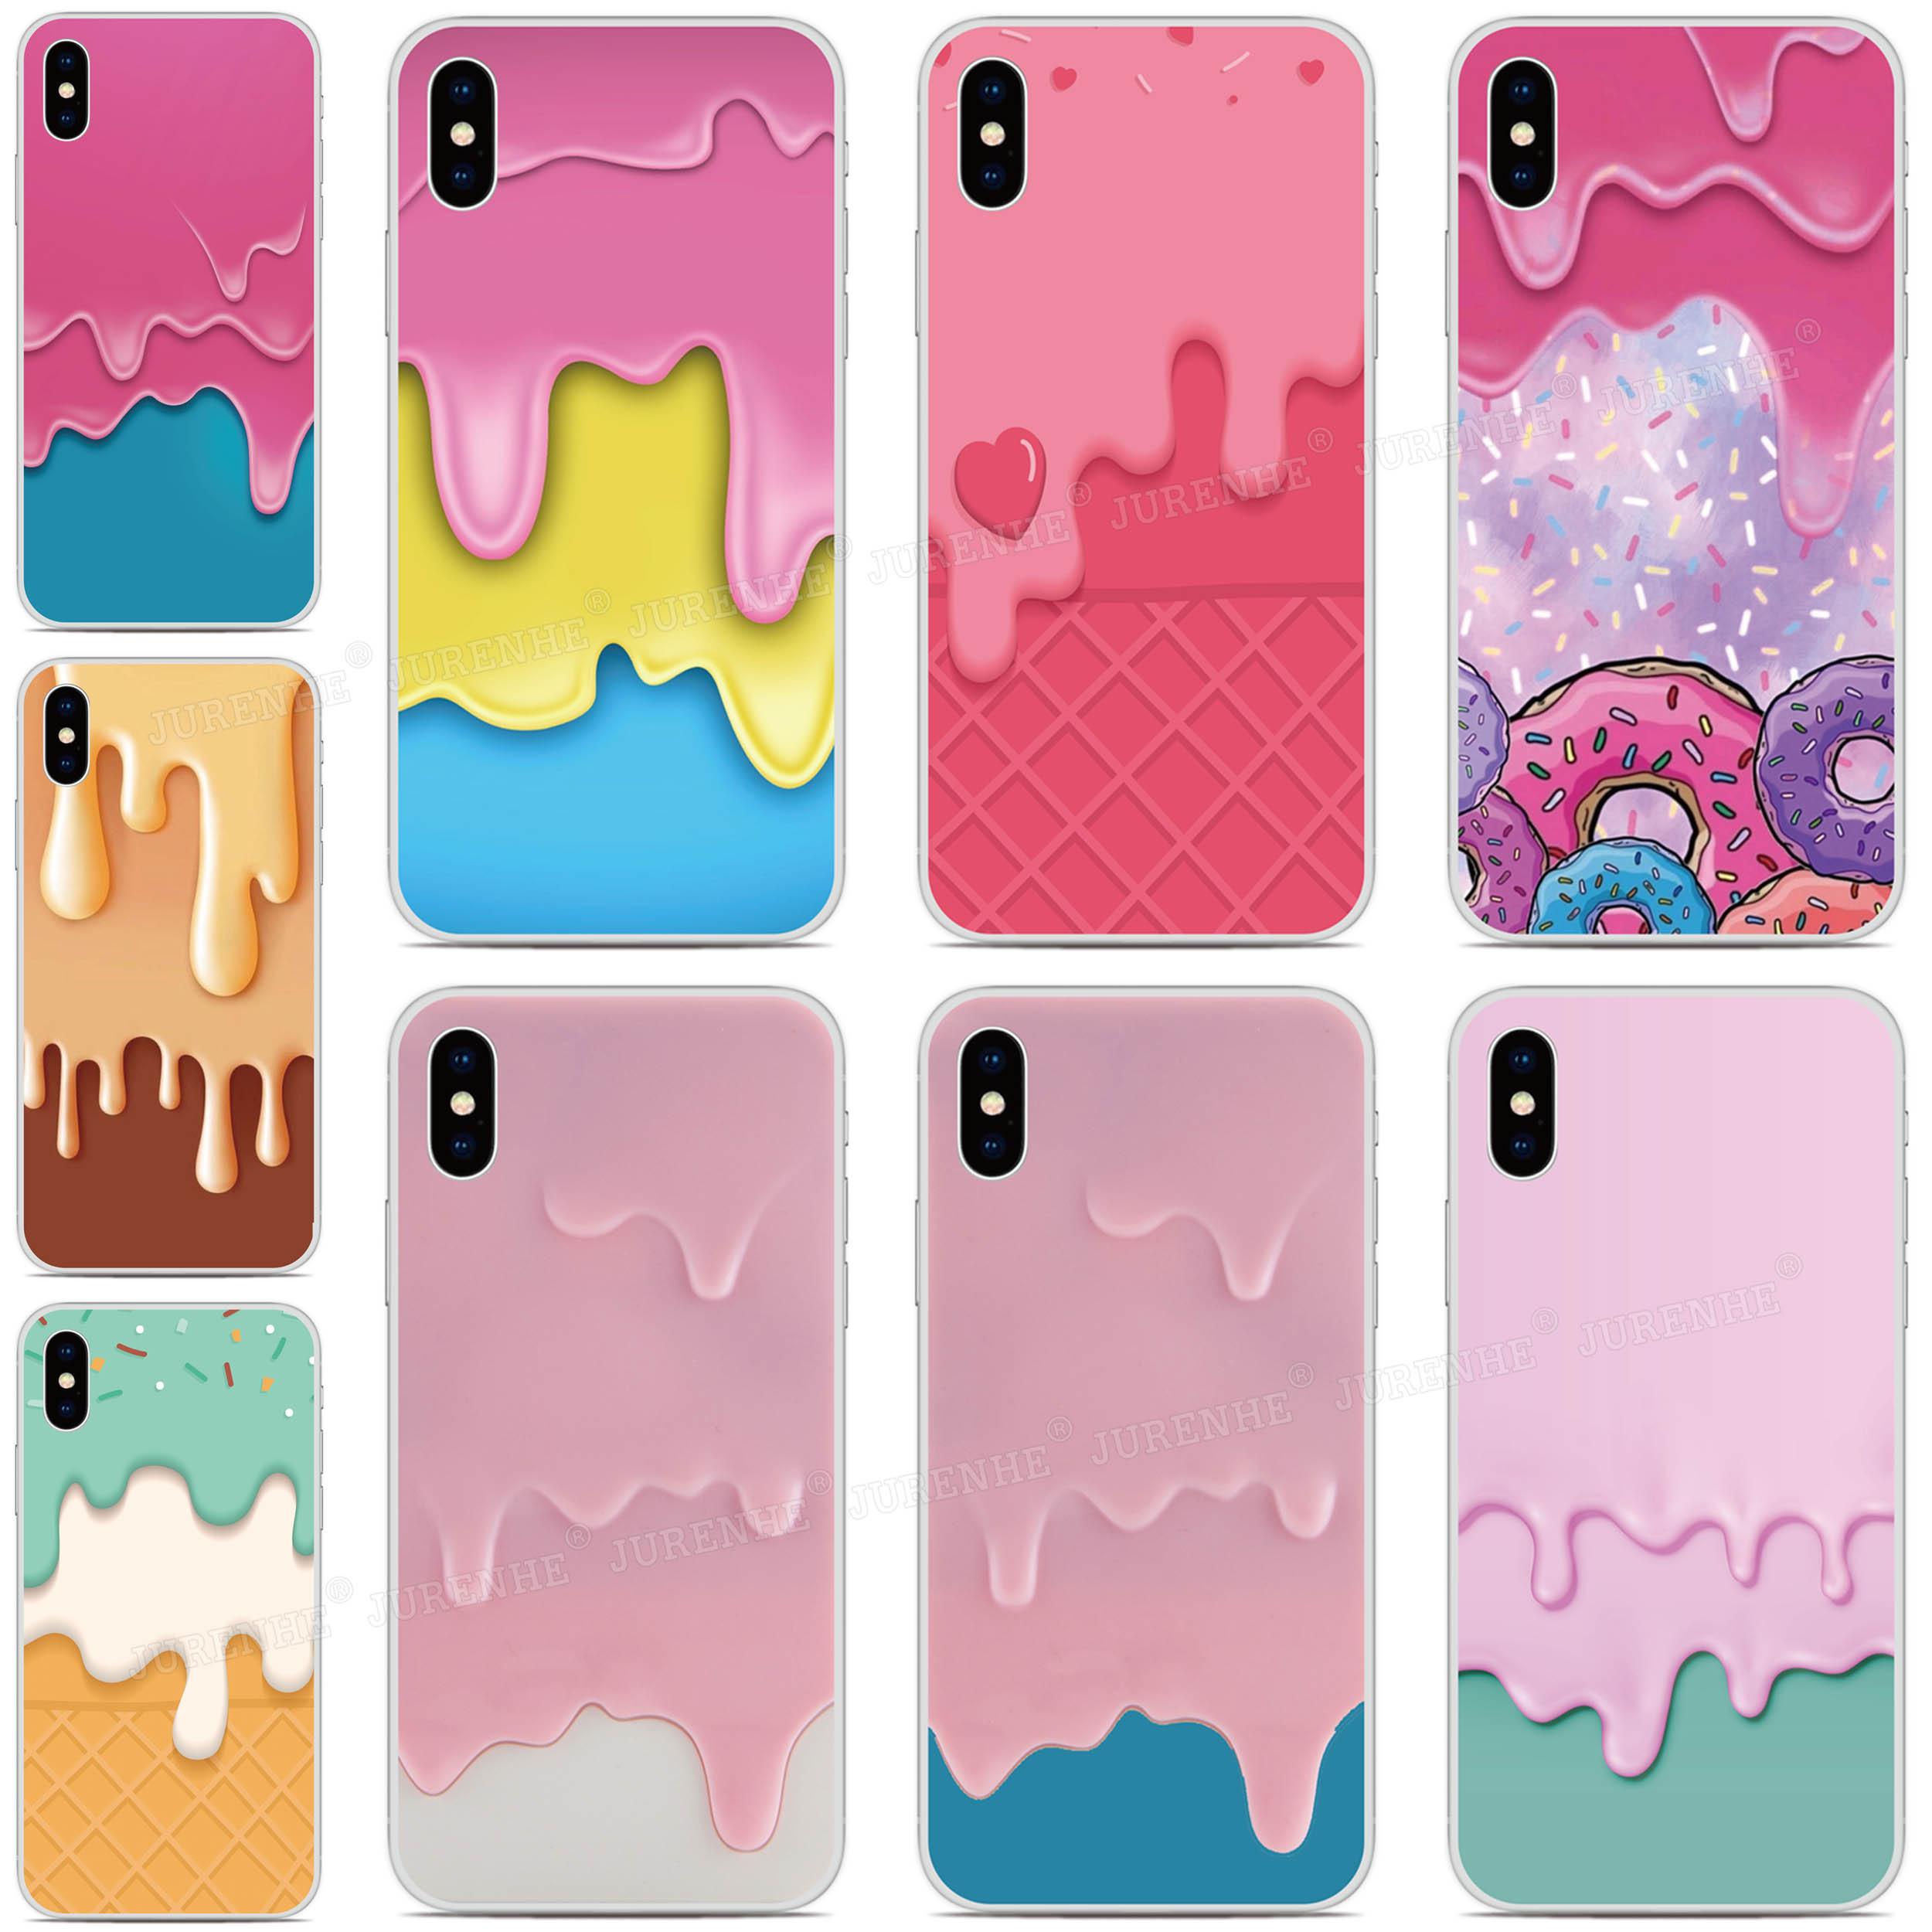 Melting Ice Cream Caso de Telefone Para Sony Xperia XZ5 5 XZ3 XZ2 XZ4 Compacto ACE XA3 XA2 XA1 Plus Ultra L4 L3 L2 20 8 10 1 II Cobertura